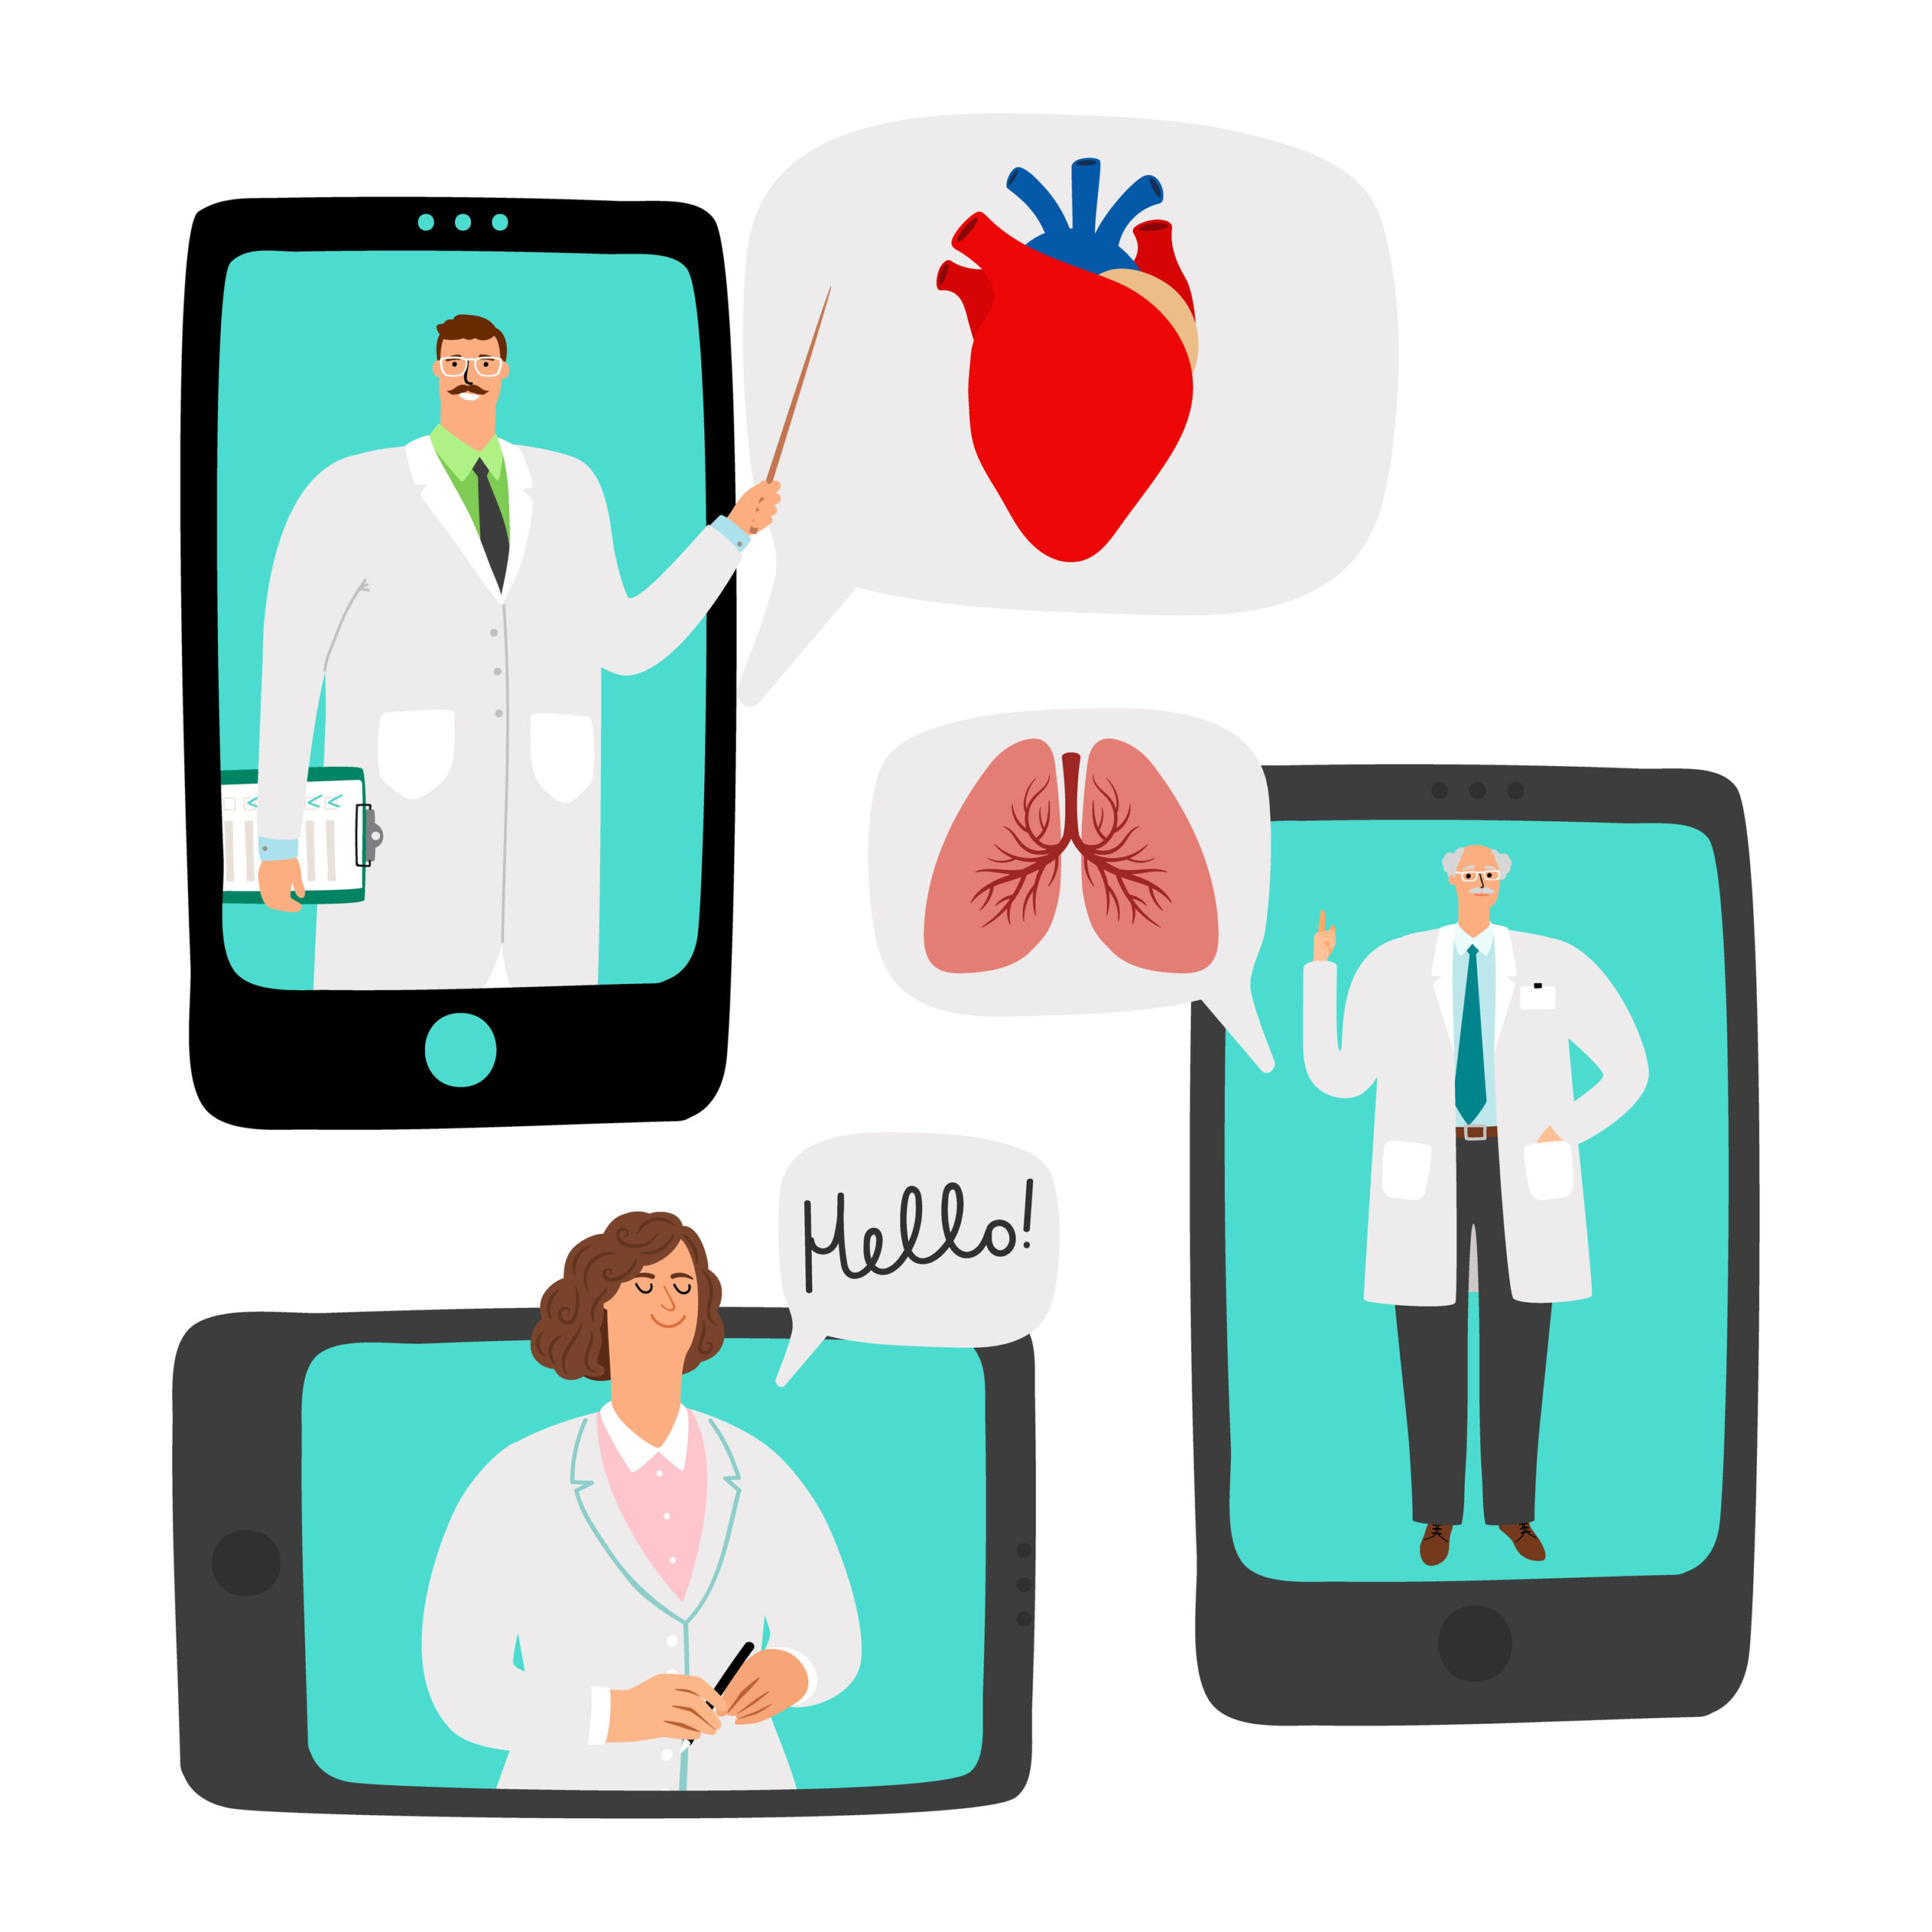 RCM - Physicians marketing ethically